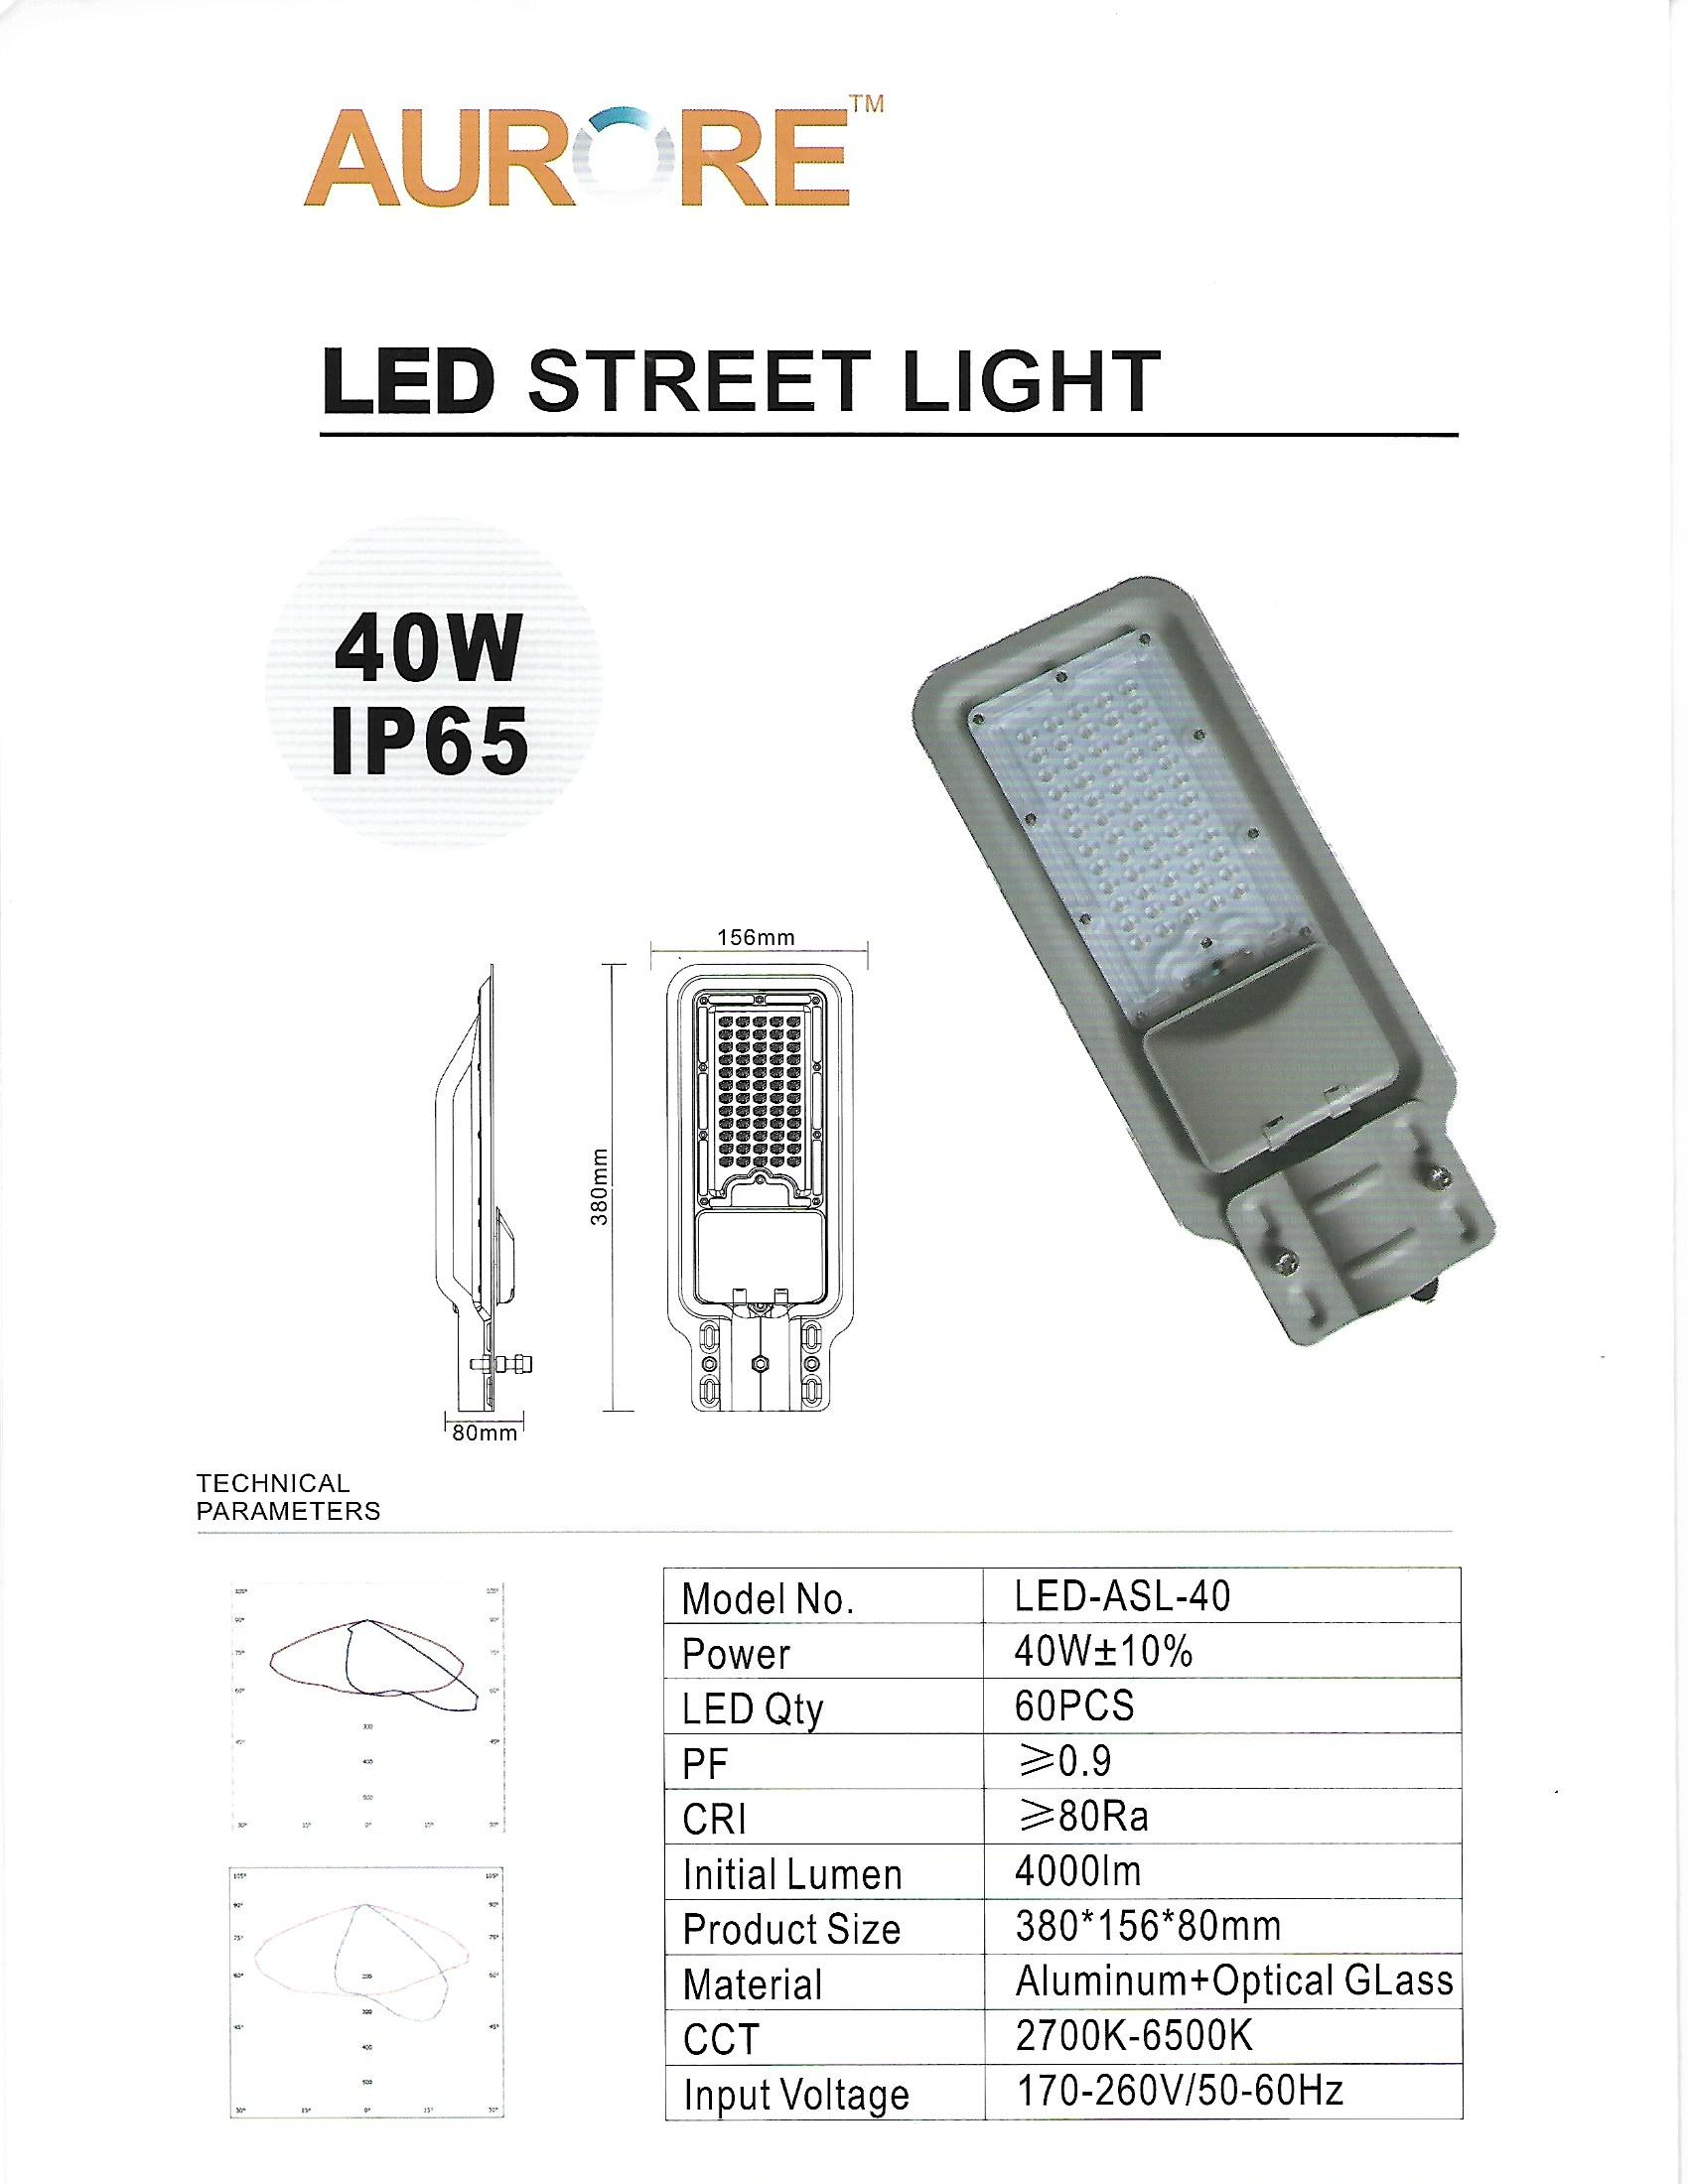 Aurore 40w led street light